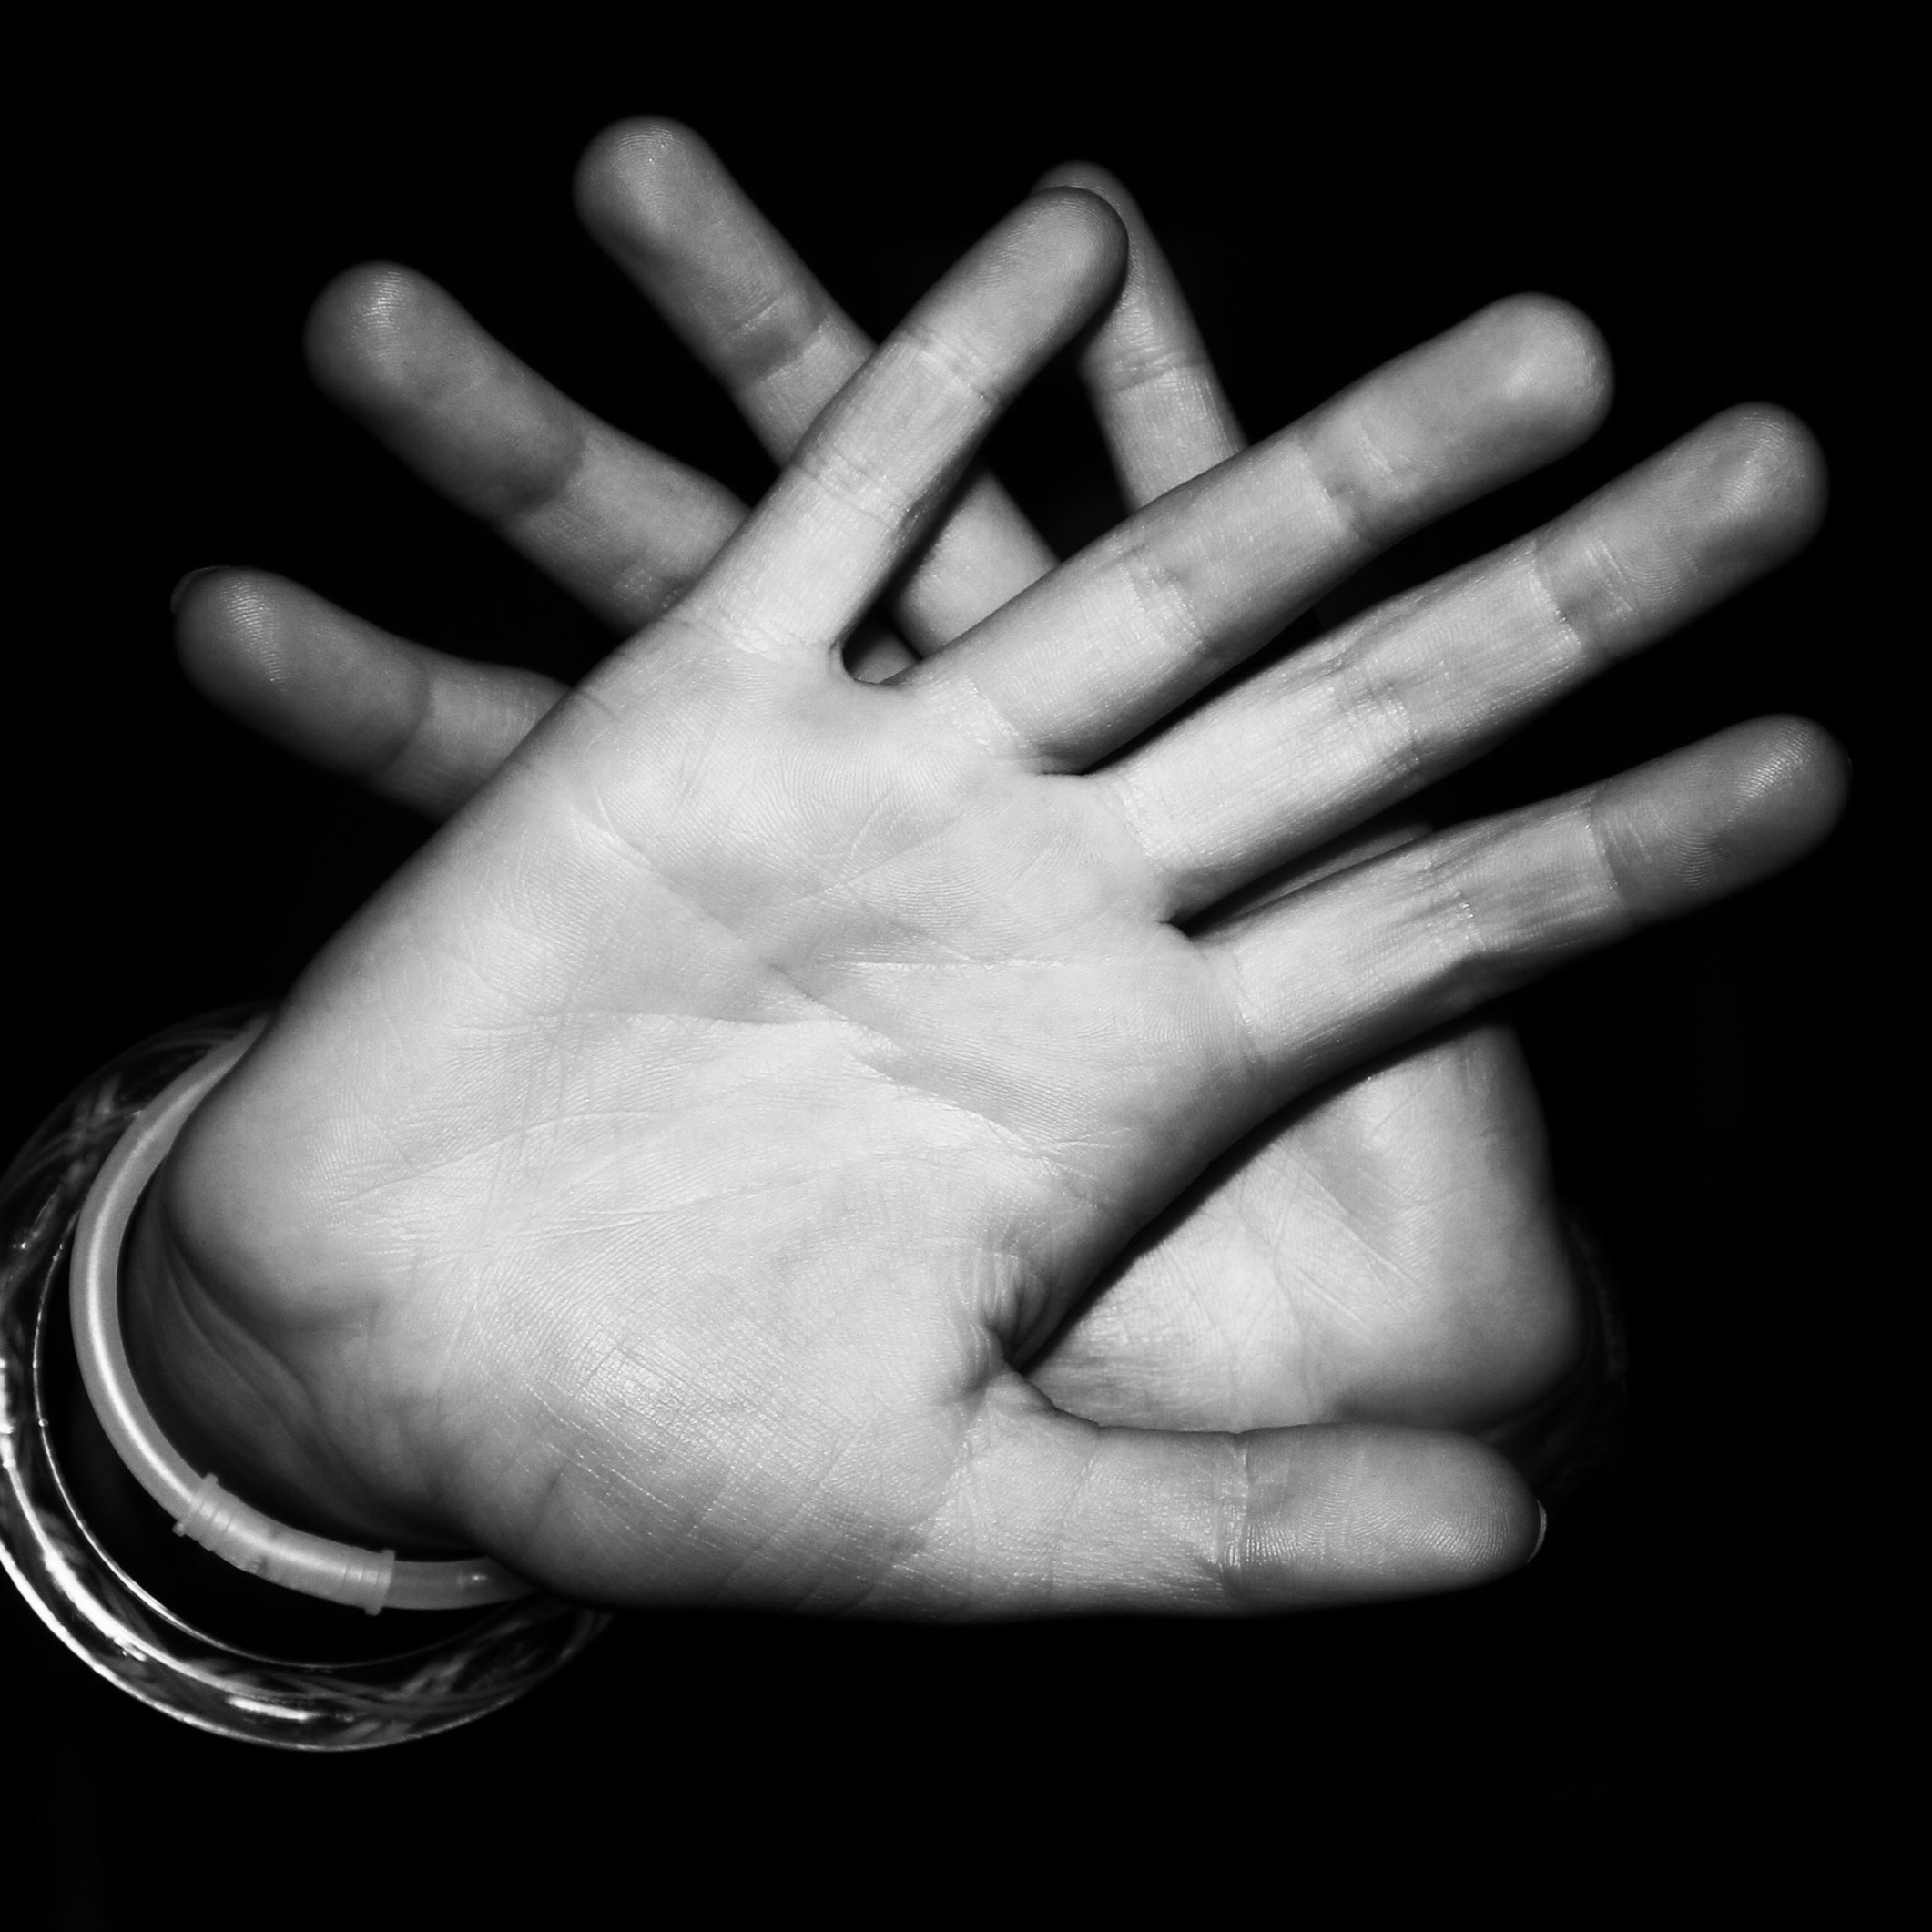 qsw hands fingers